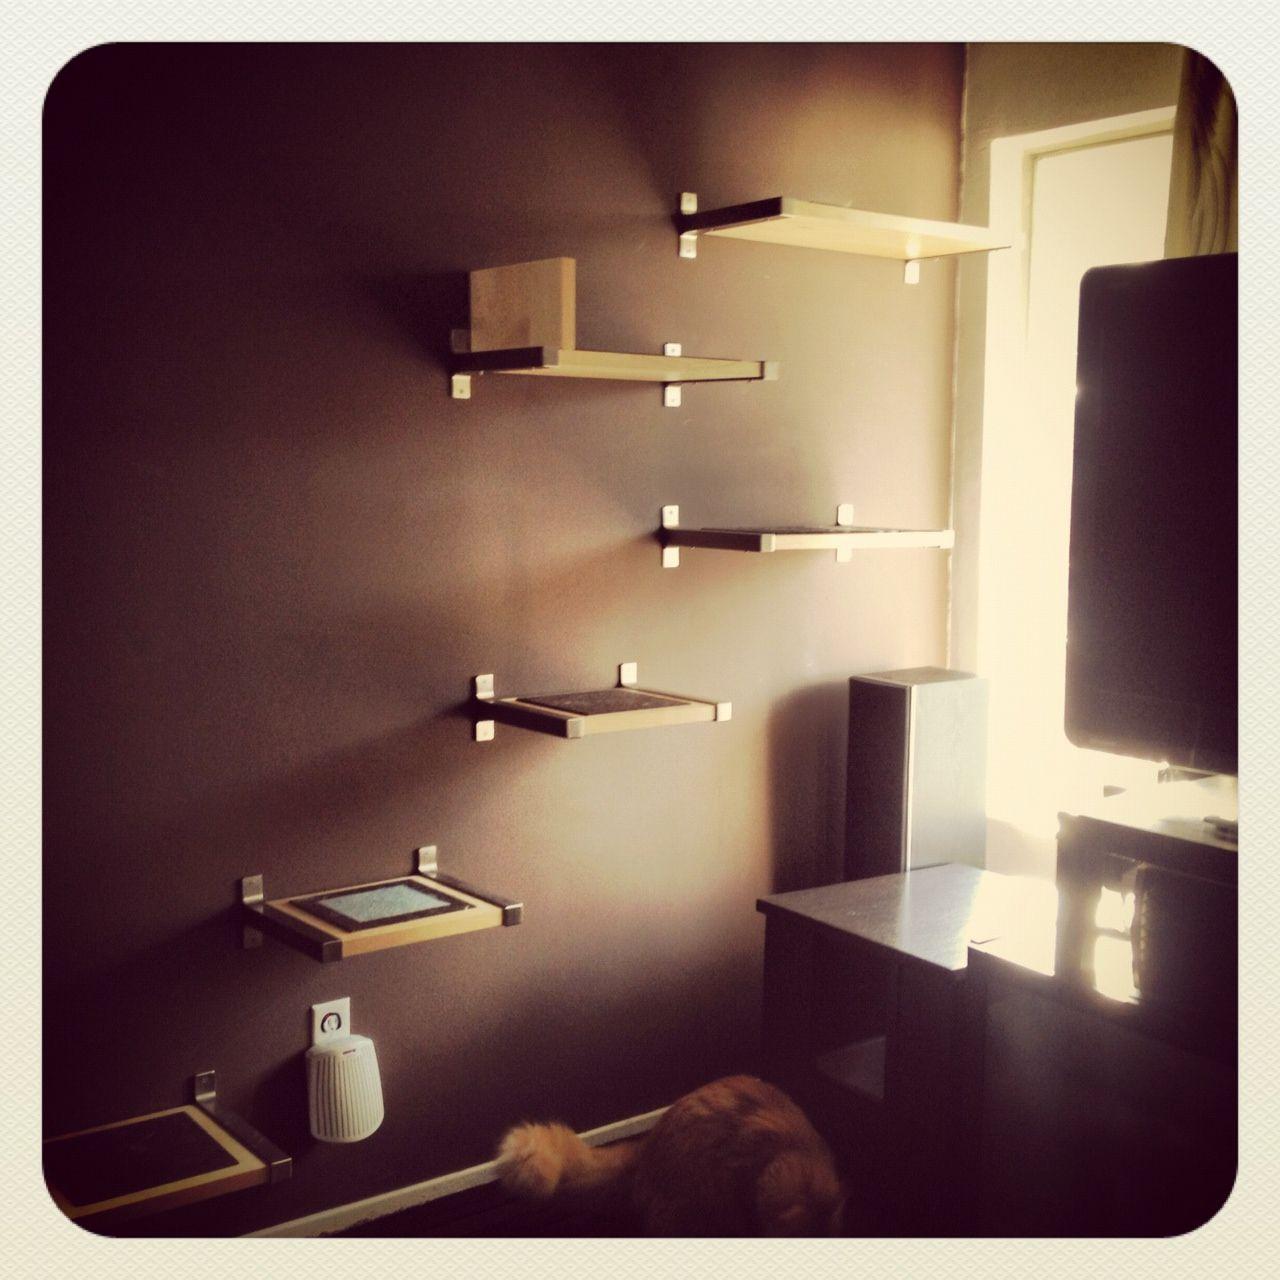 diy cat shelves handmade at home pinterest katzen und h uschen. Black Bedroom Furniture Sets. Home Design Ideas